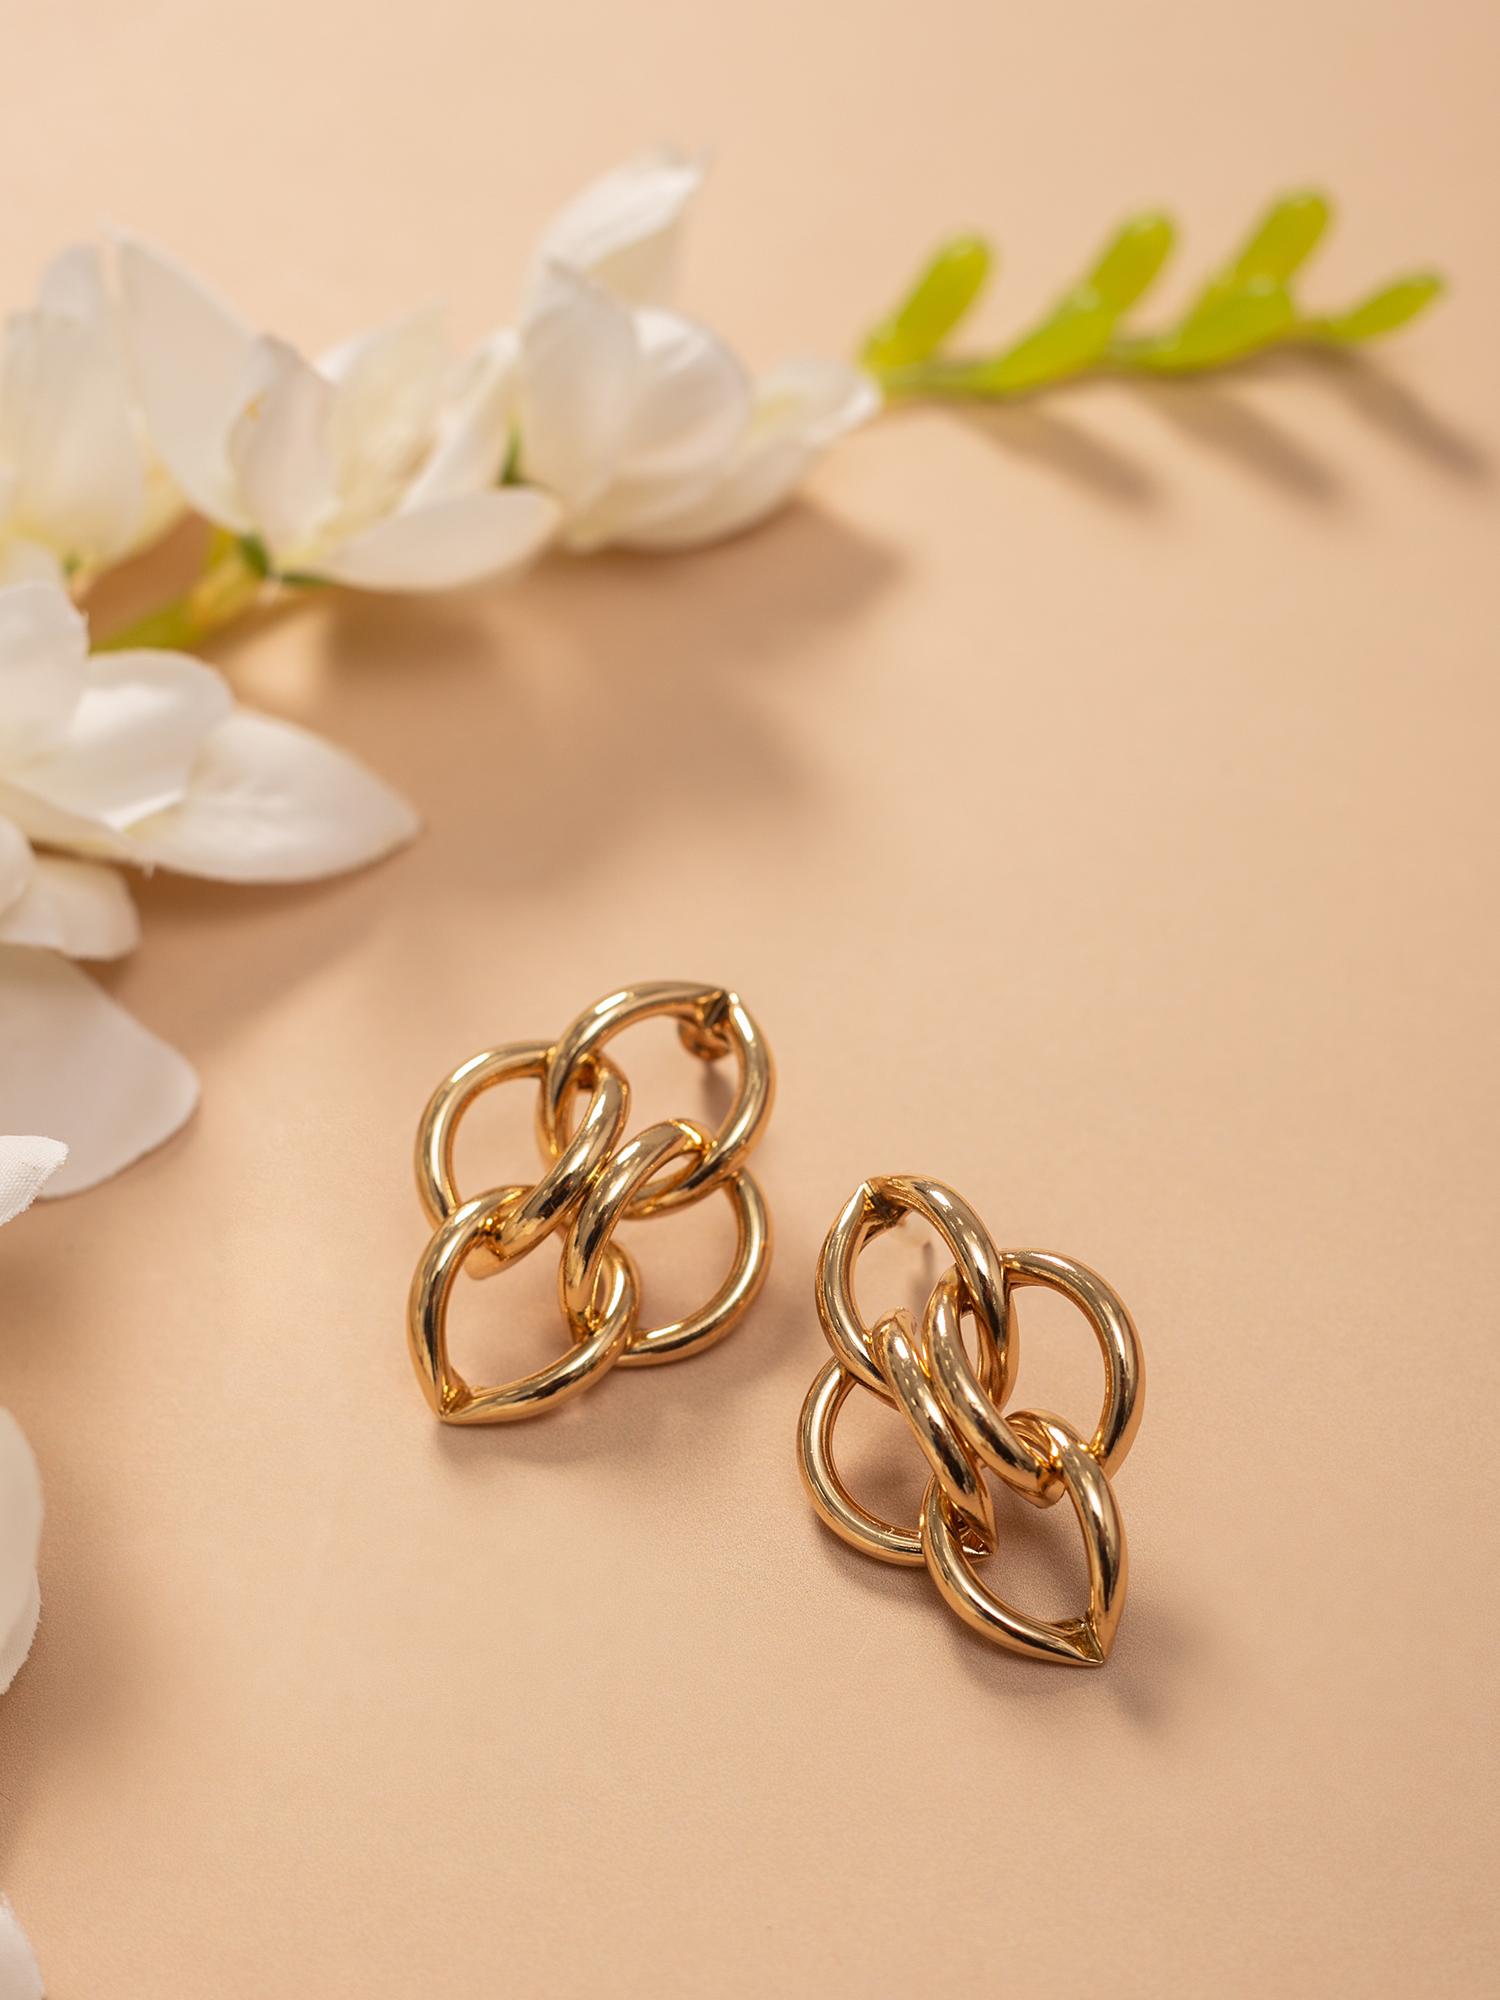 Earrings-Spring Time Love Earrings2